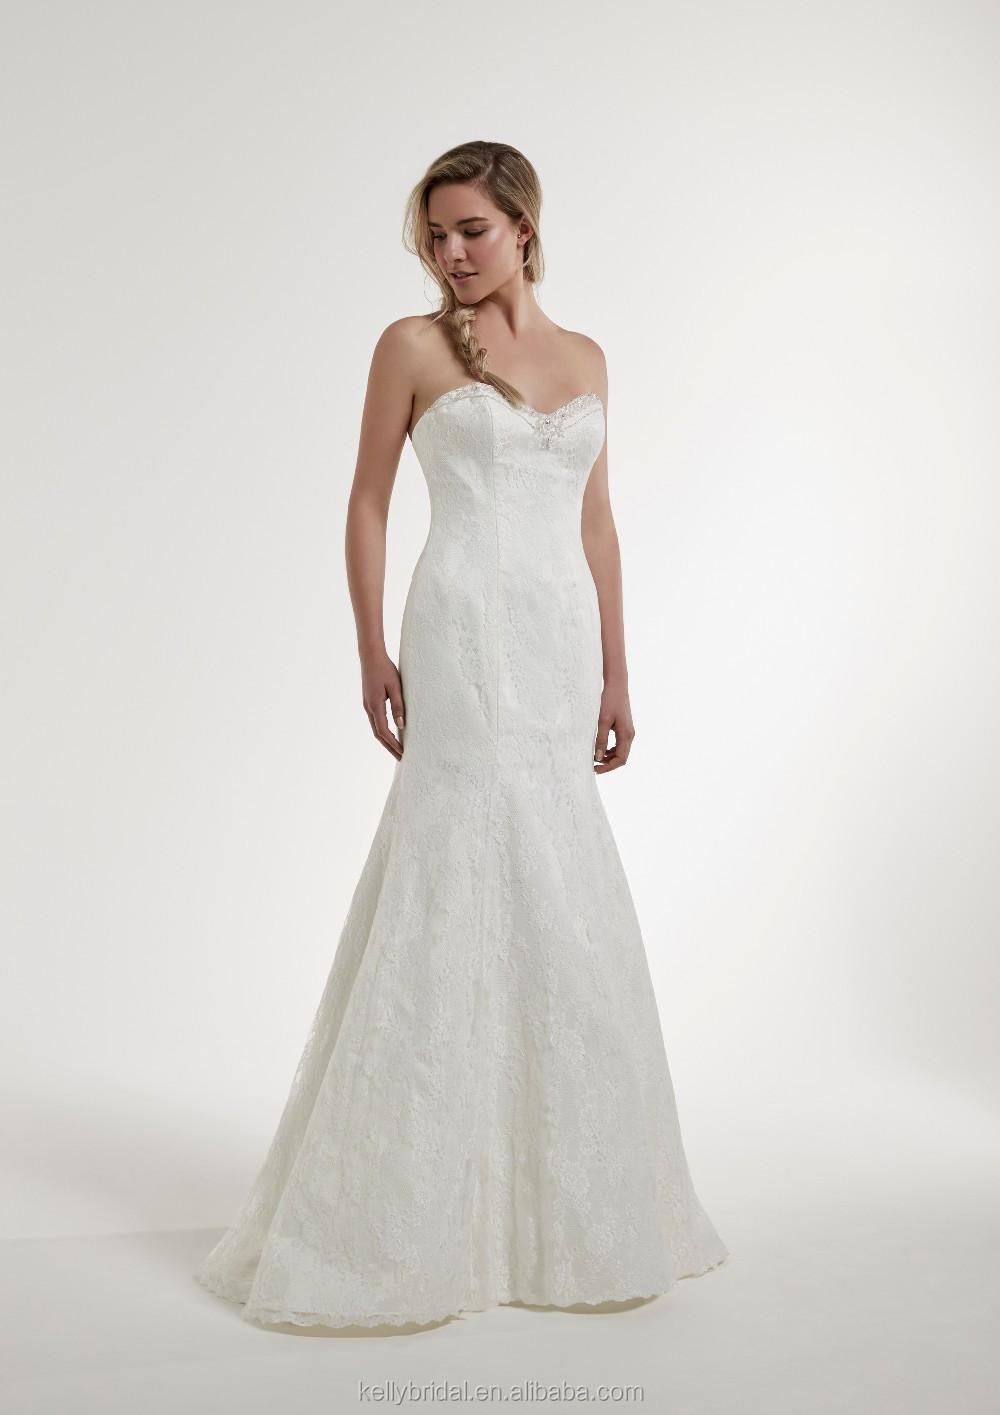 Zm16144 Beaded Lace Neck Line French Style Wedding Dress Custom Made ...